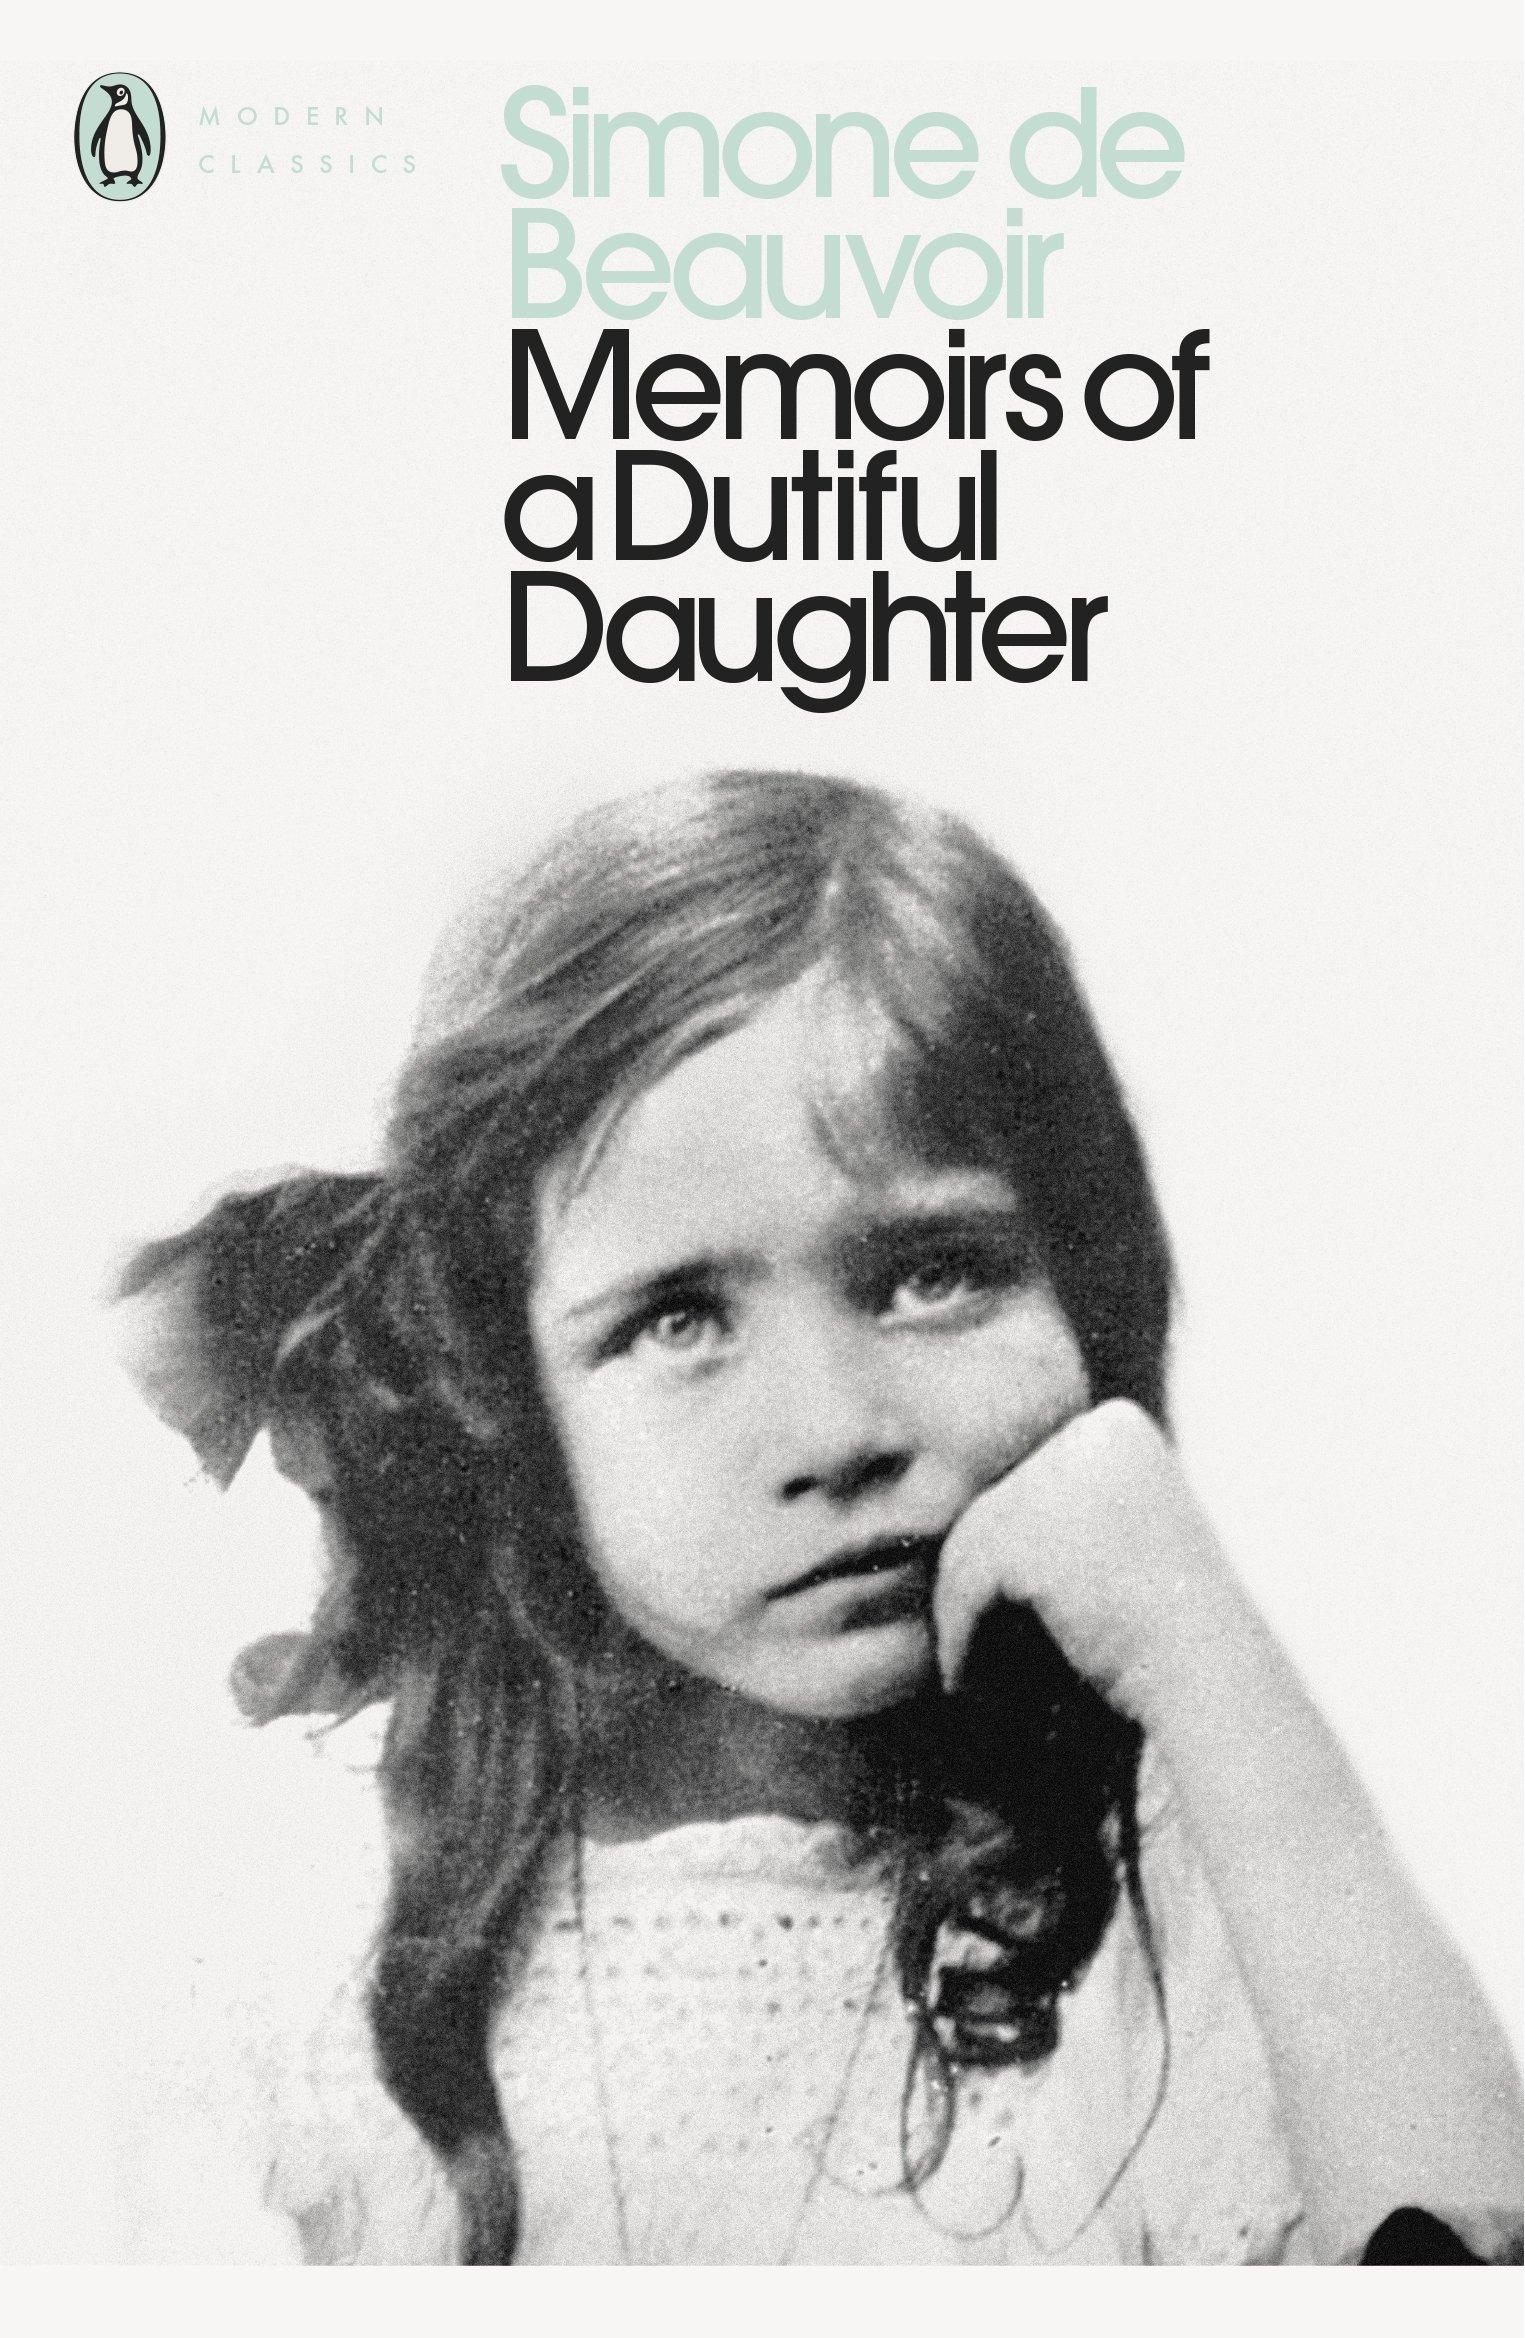 Amazon.com: Modern Classics Memoirs of a Dutiful Daughter (Penguin Modern  Classics) (8601416937991): Beauvoir Simone De, James Kirkup: Books